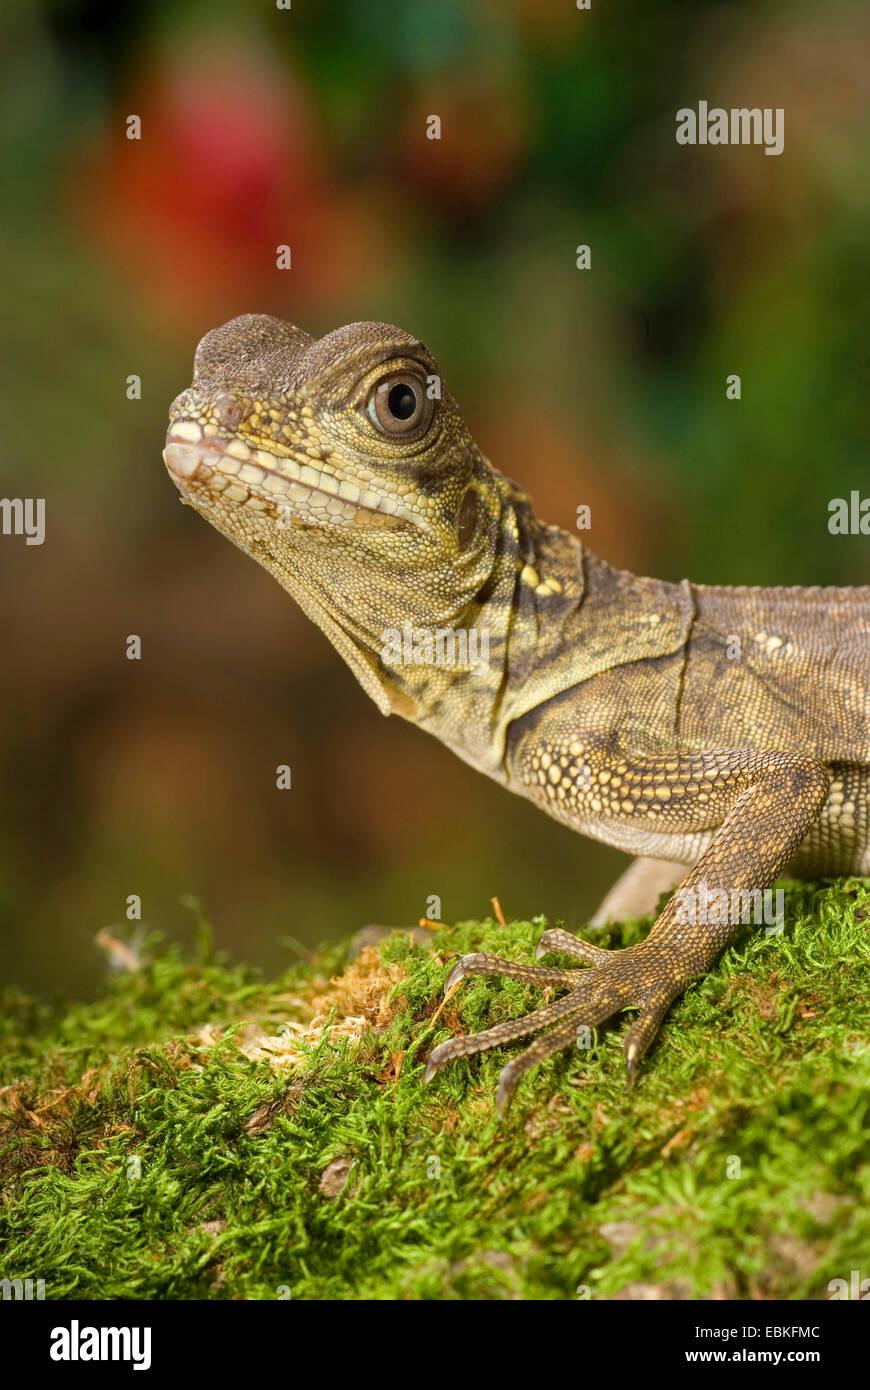 Weber's sail-fin lizard, Webers sail-fin dragon, green sail-fin dragon, soa soa (Hydrosaurus weberi), portrait - Stock Image